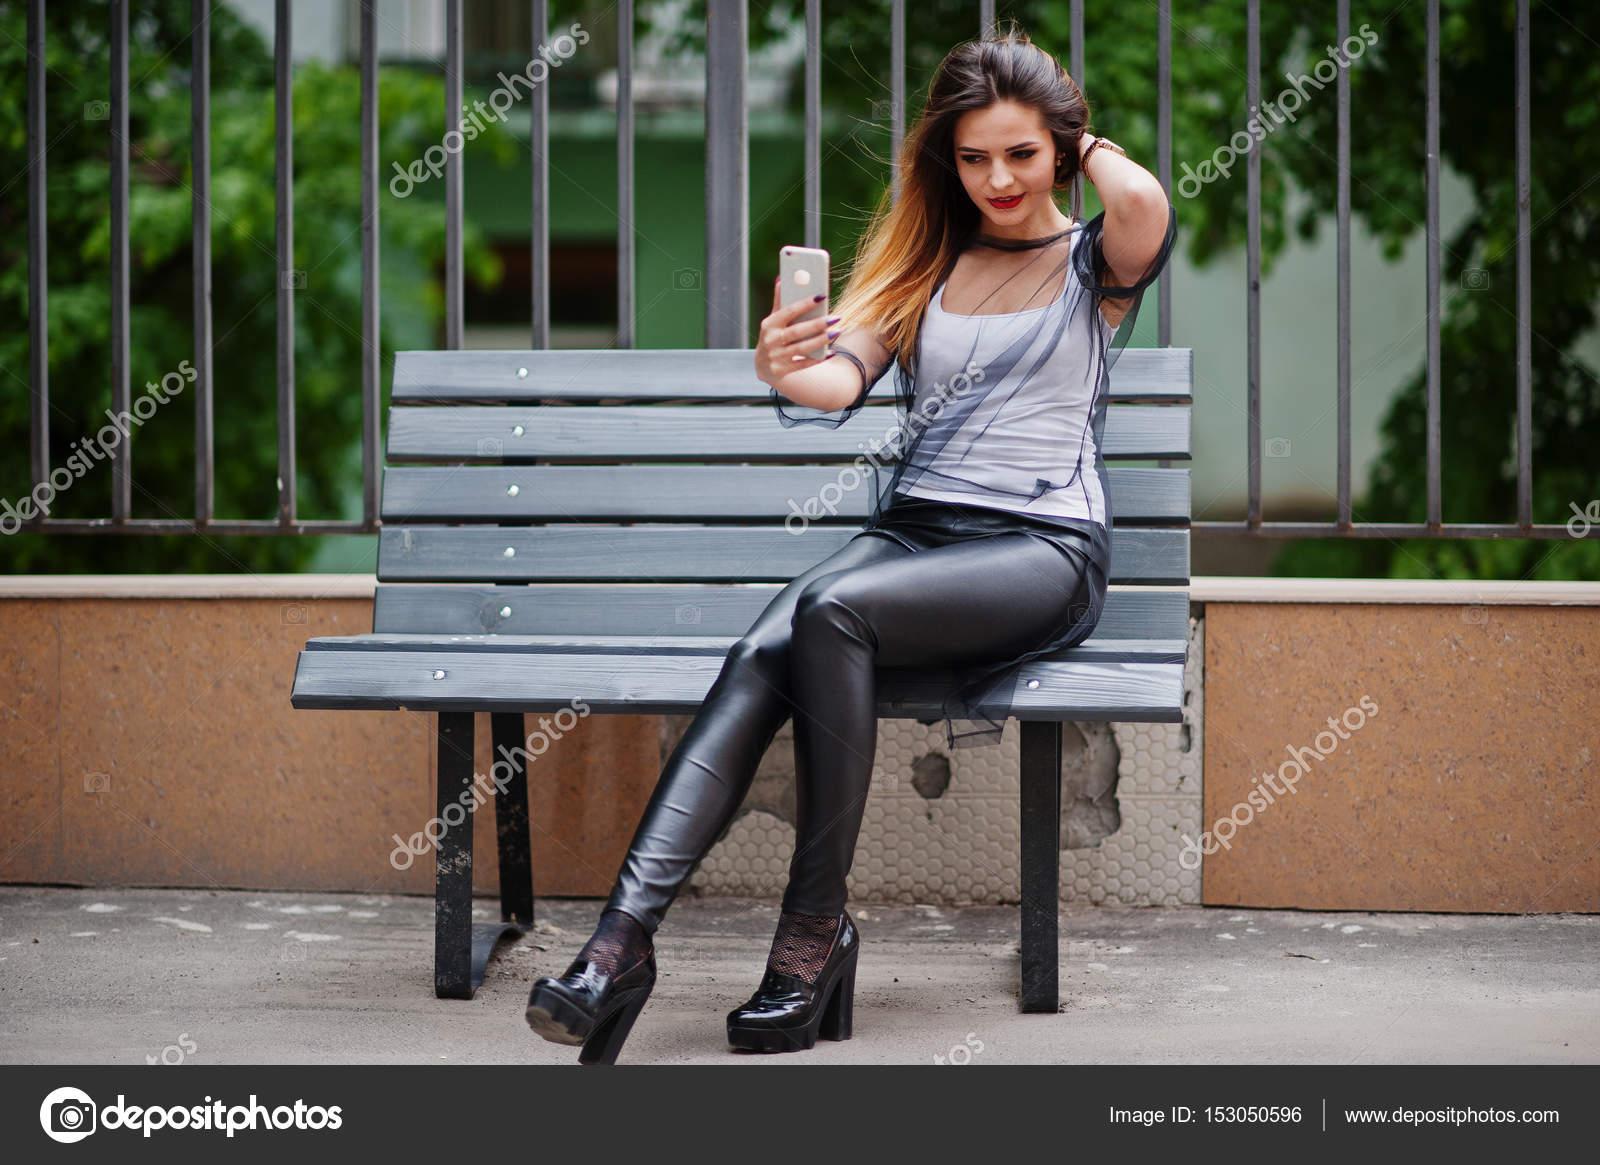 Порно прозрачные штаны фото на улице дама ххх видео